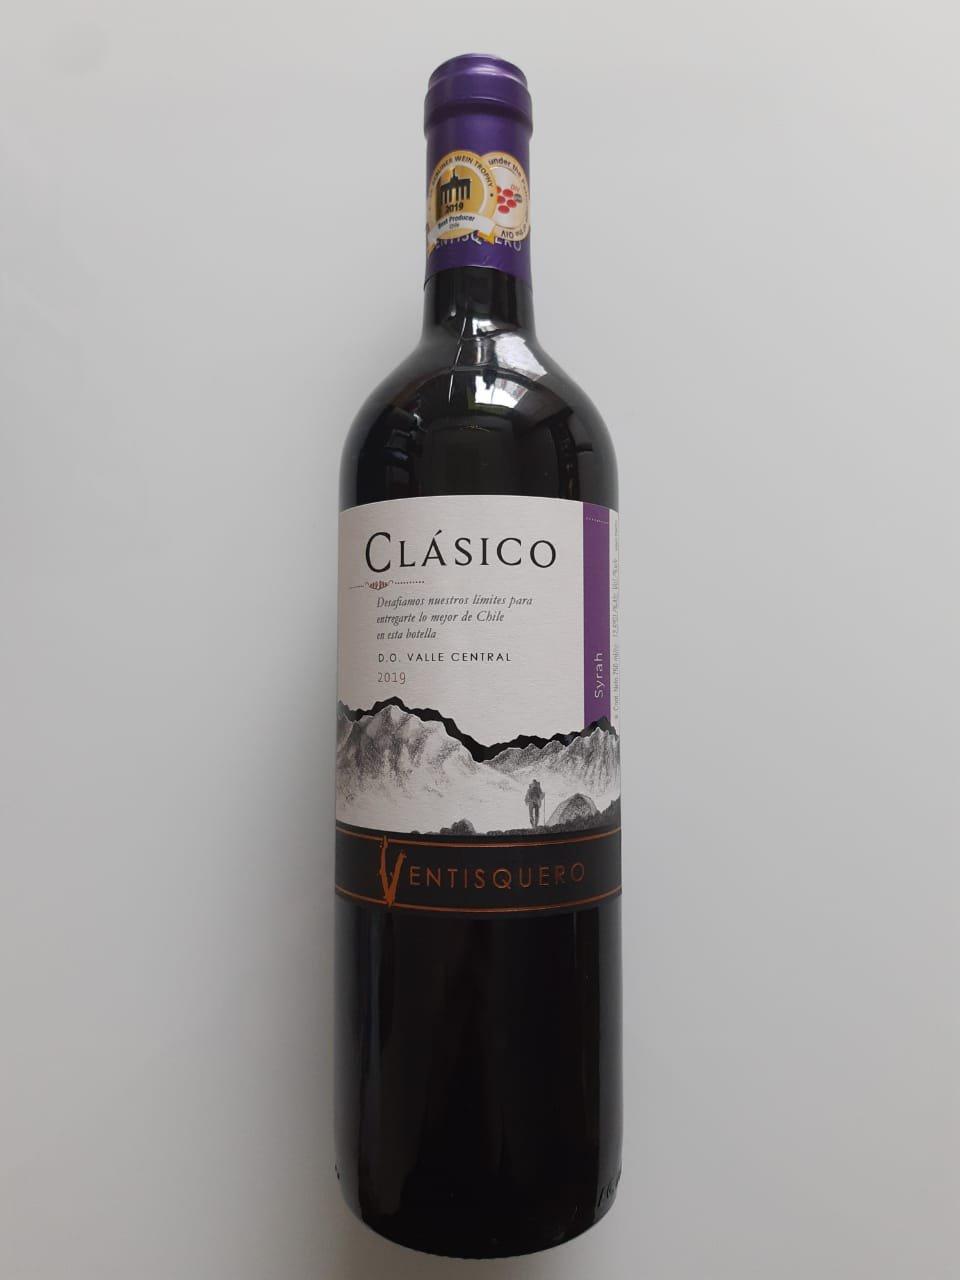 Vinho Ventisquero Clásico Syrah 750ml